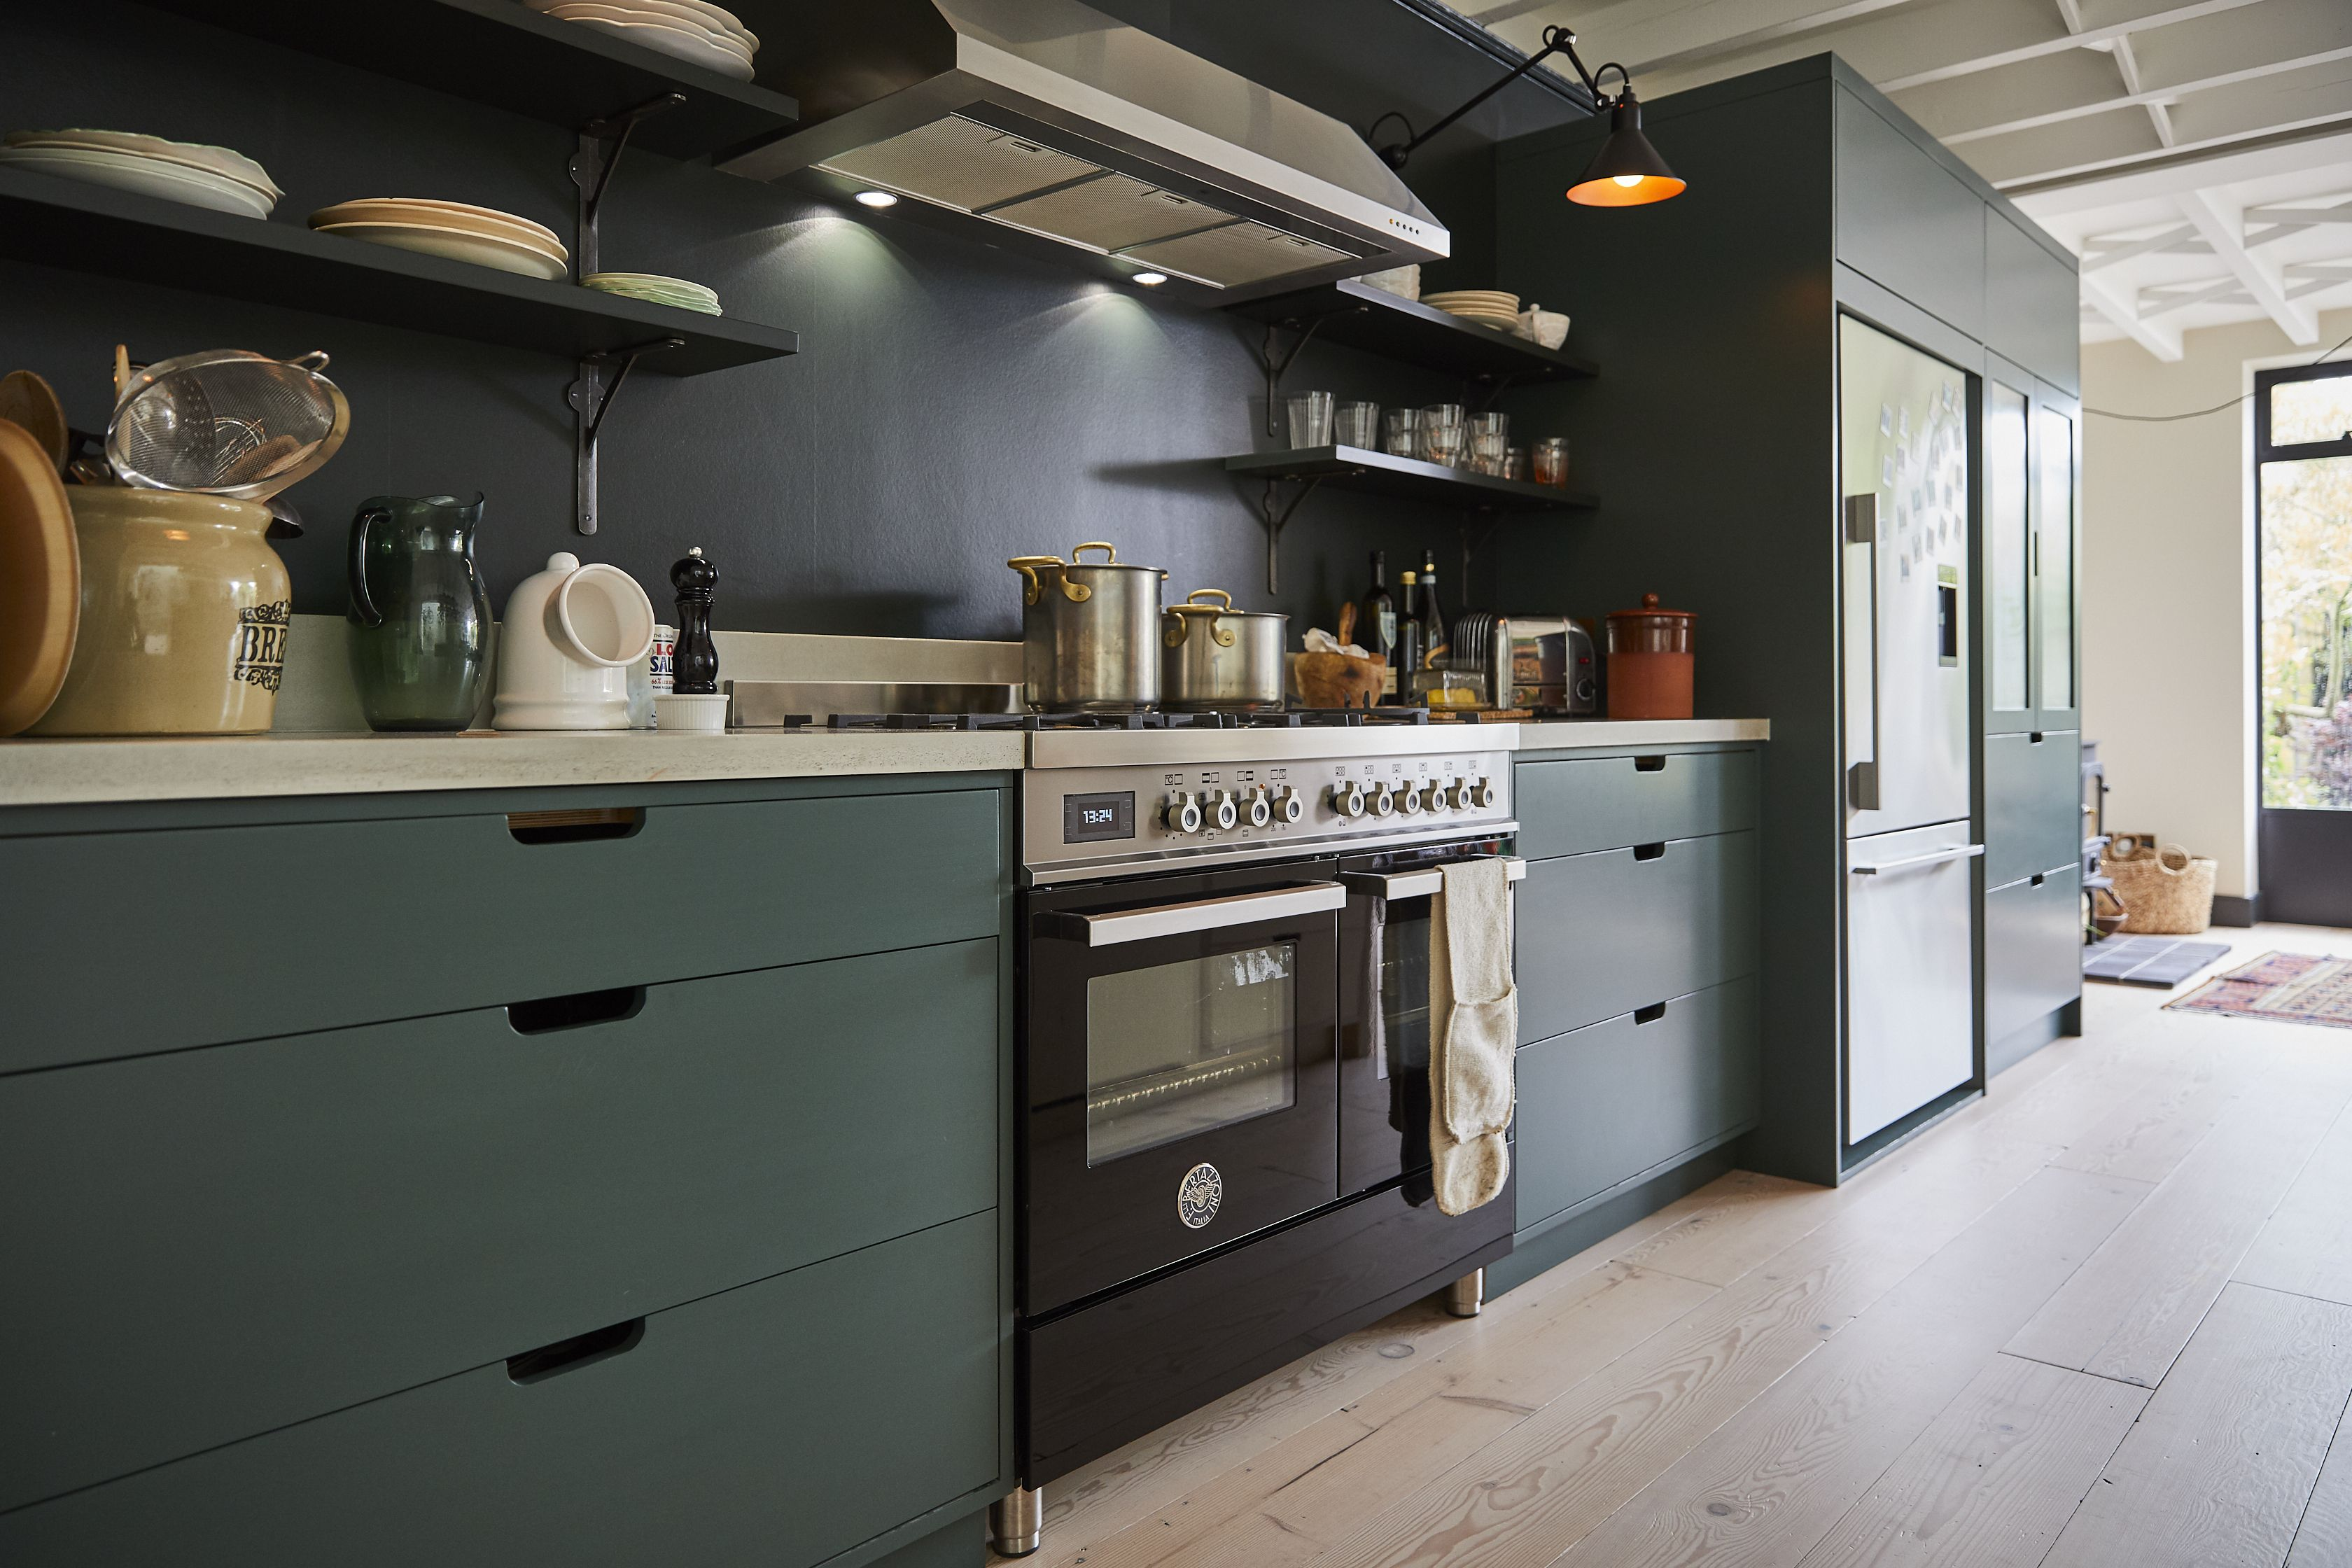 Bespoke Kitchen Project 25 Barnes Bespoke Kitchens Kitchen Projects Solid Wood Kitchens